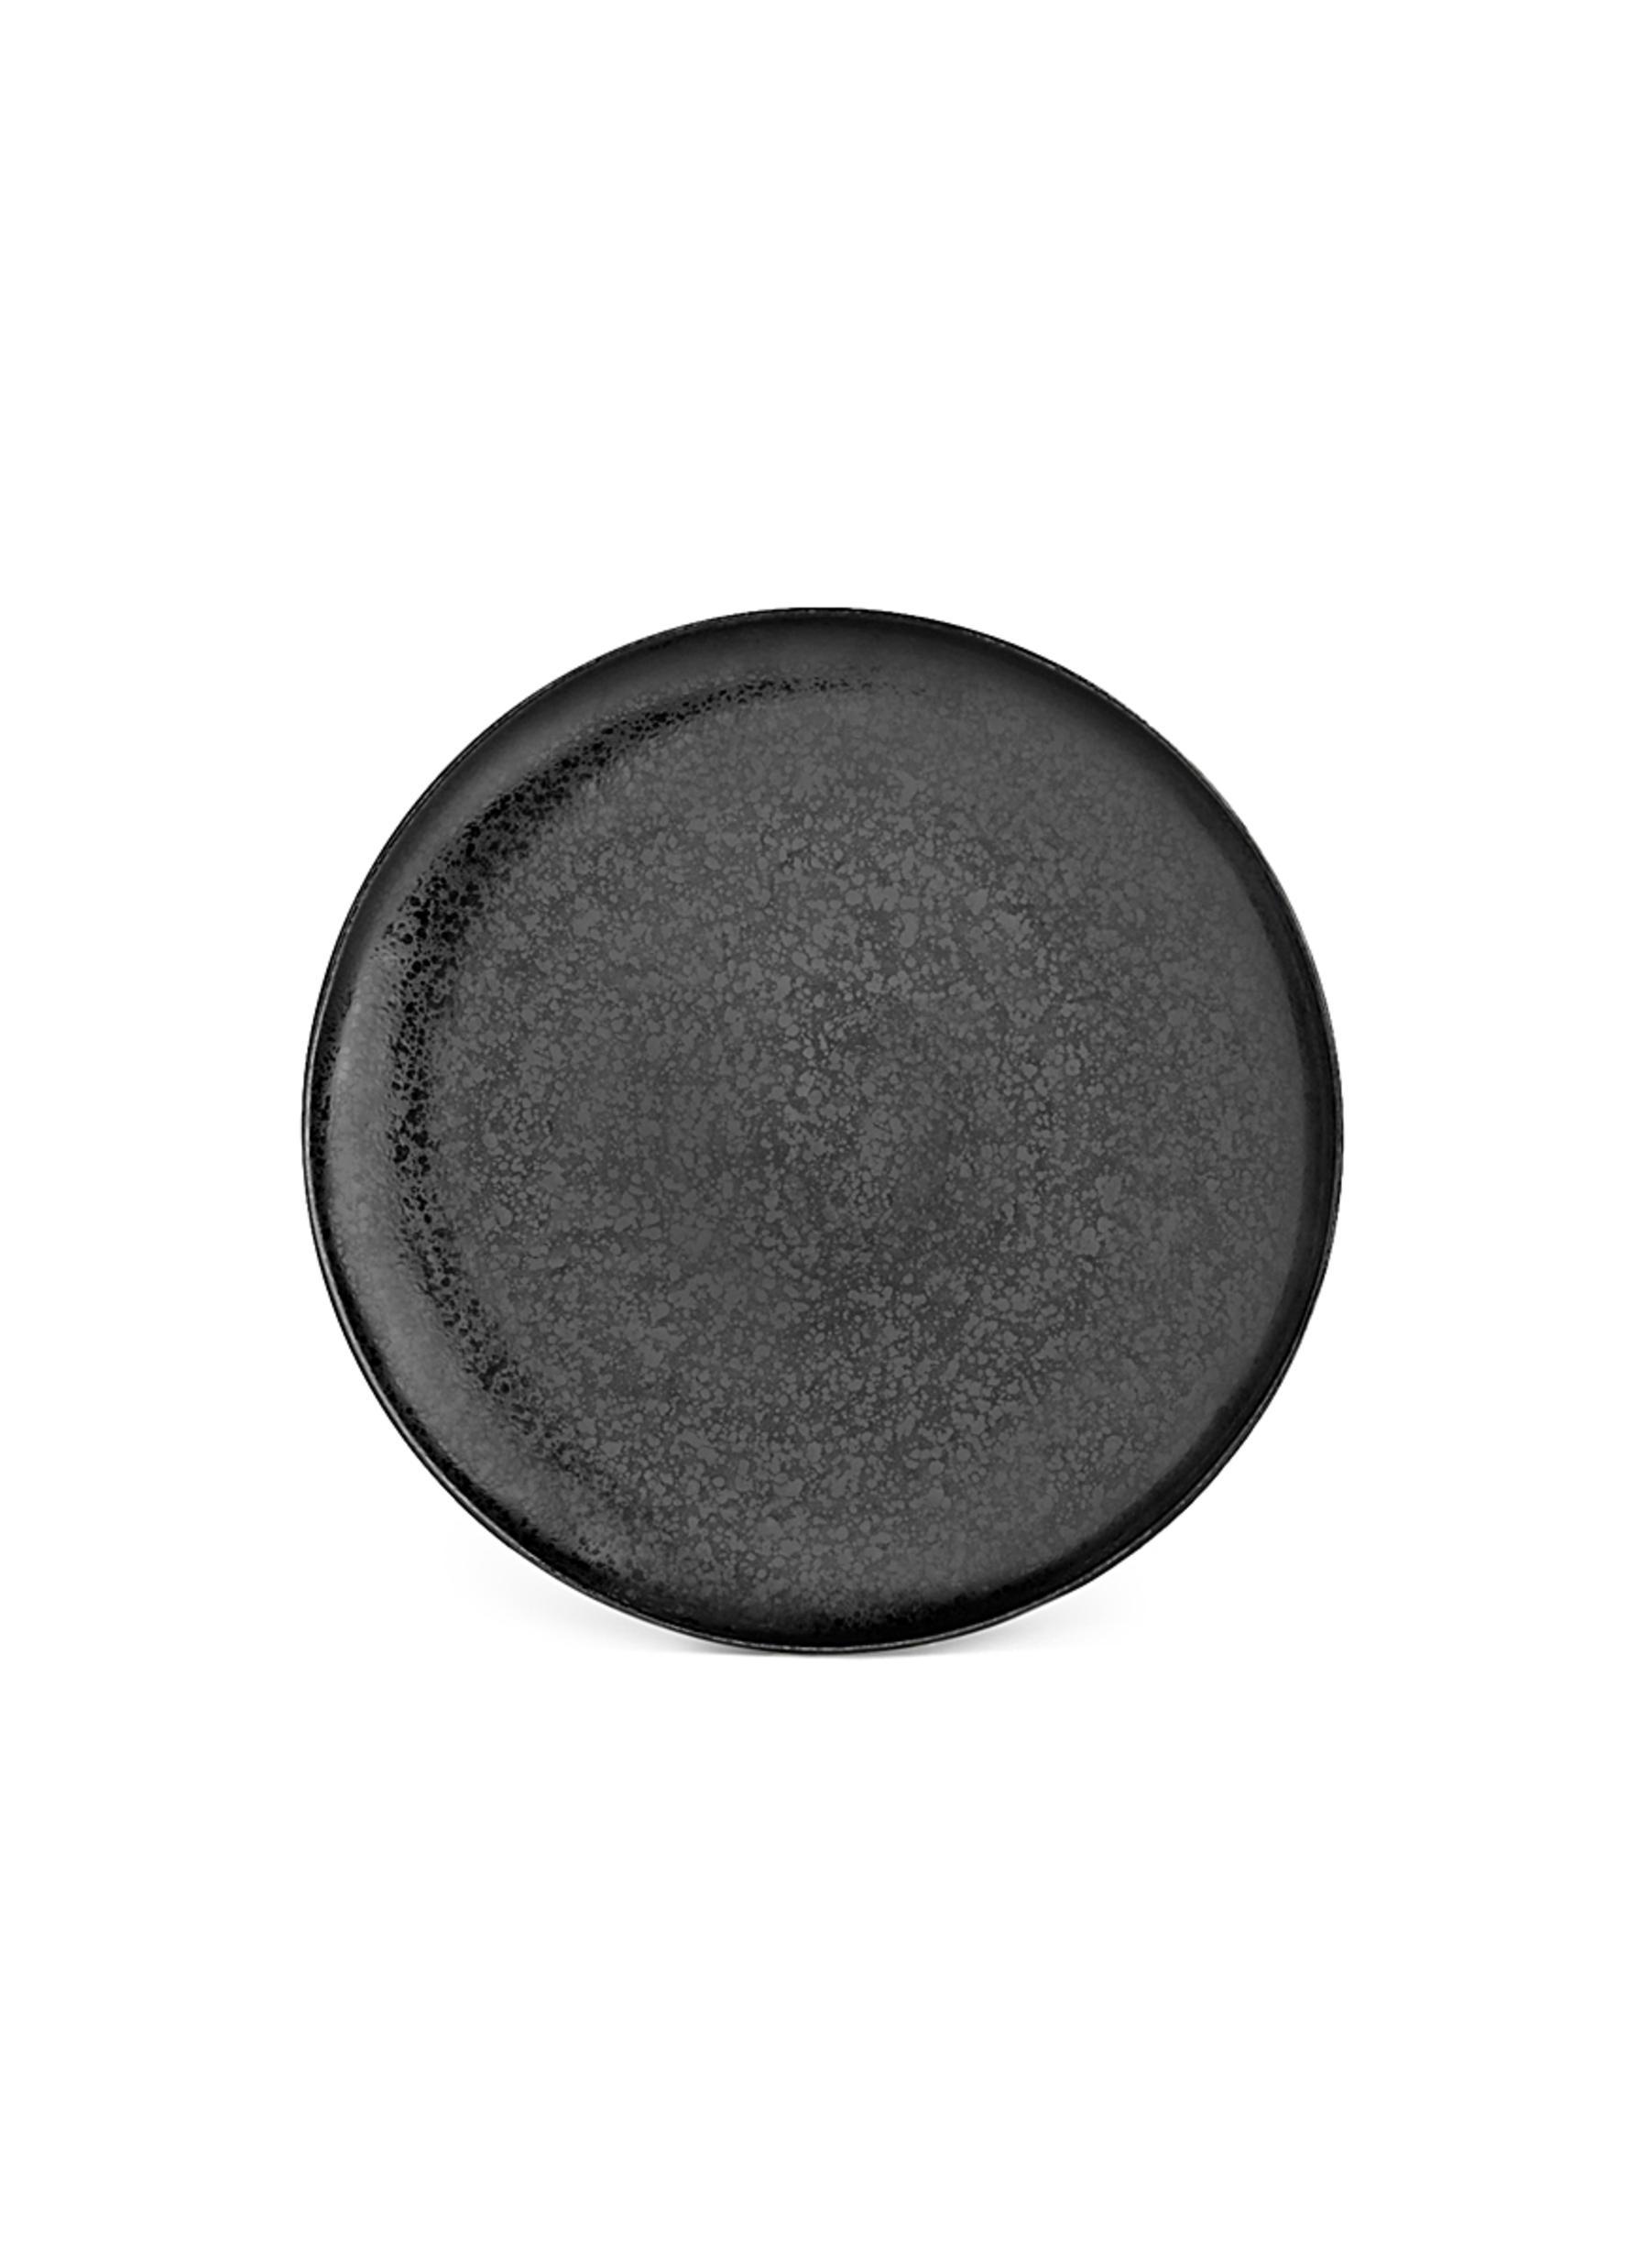 lobjet female alchimie charger plate black